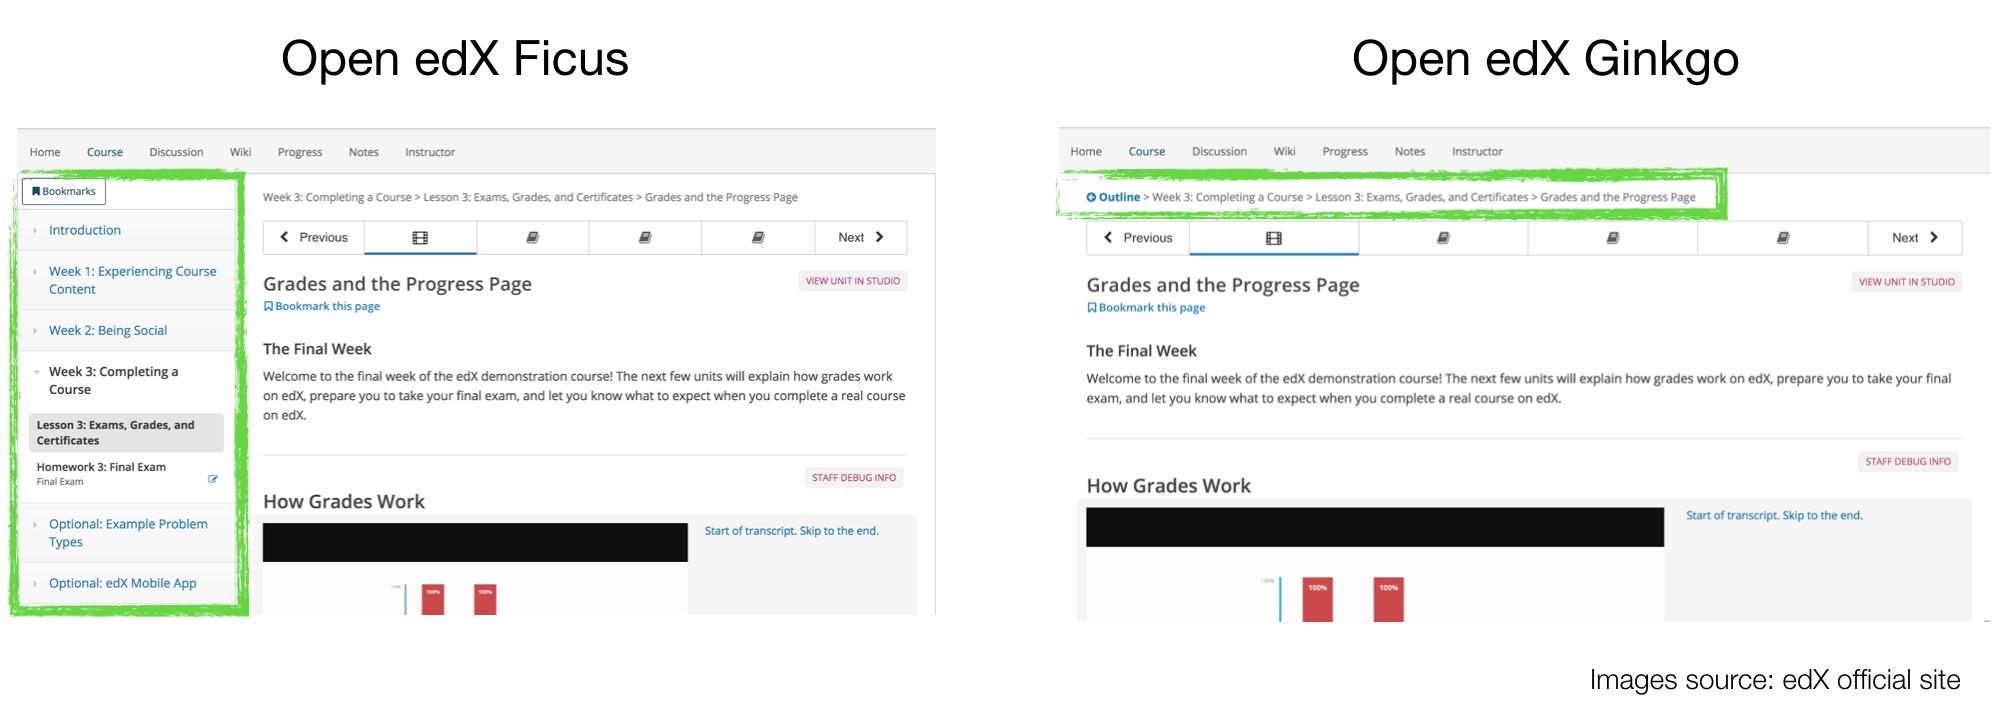 Open edX Ginkgo - Meet The New Release | Raccoon Gang Blog